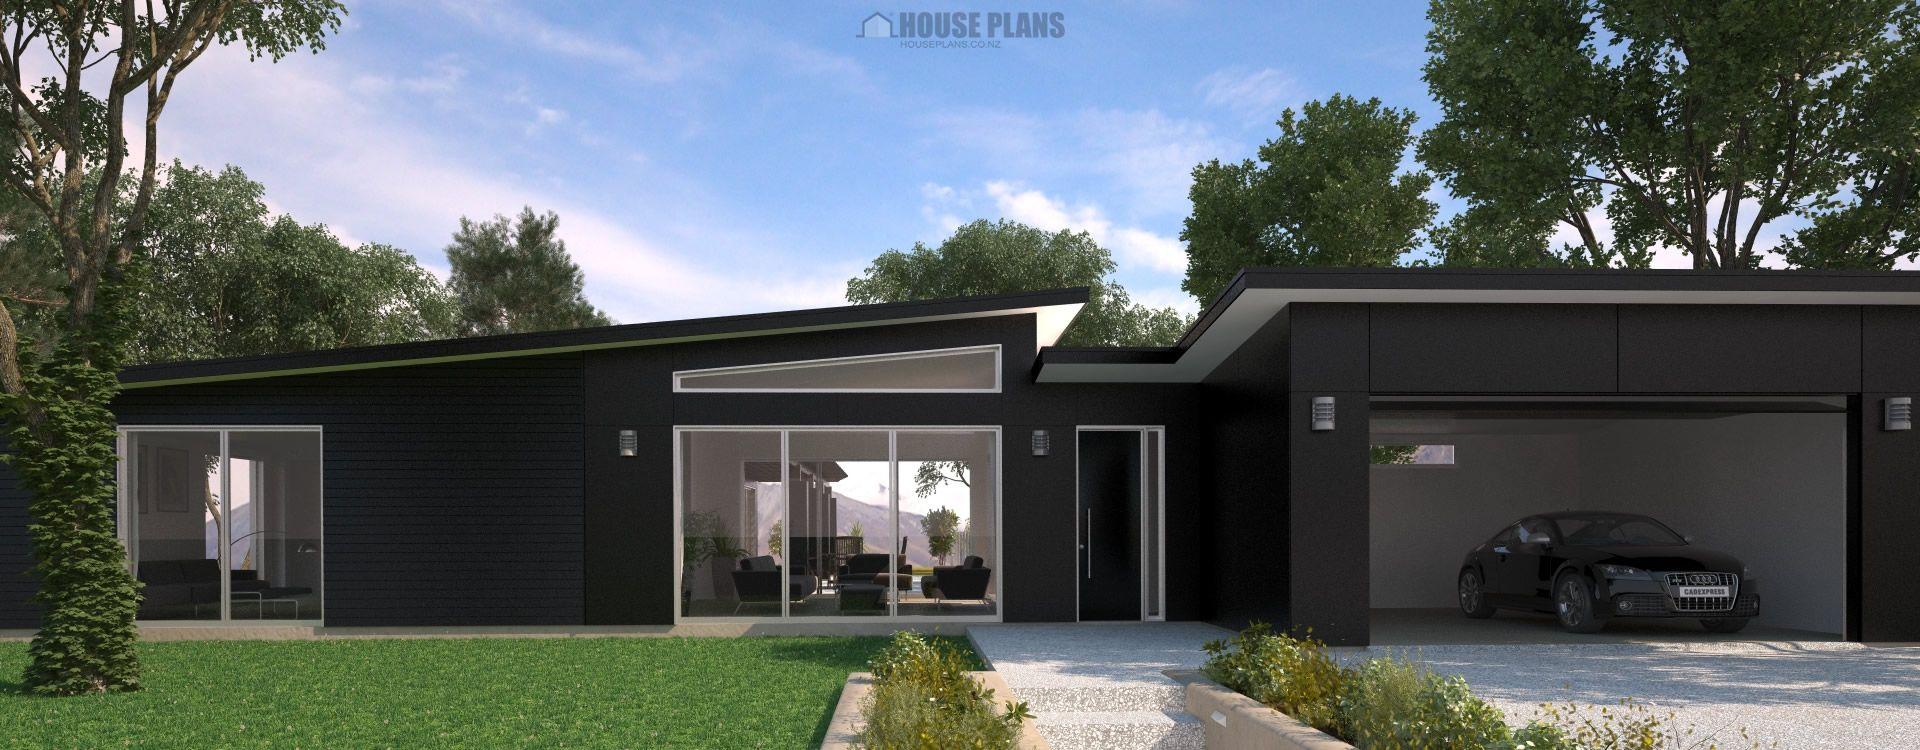 Zen Lifestyle 3, 4 Bedroom HOUSE PLANS NEW ZEALAND LTD